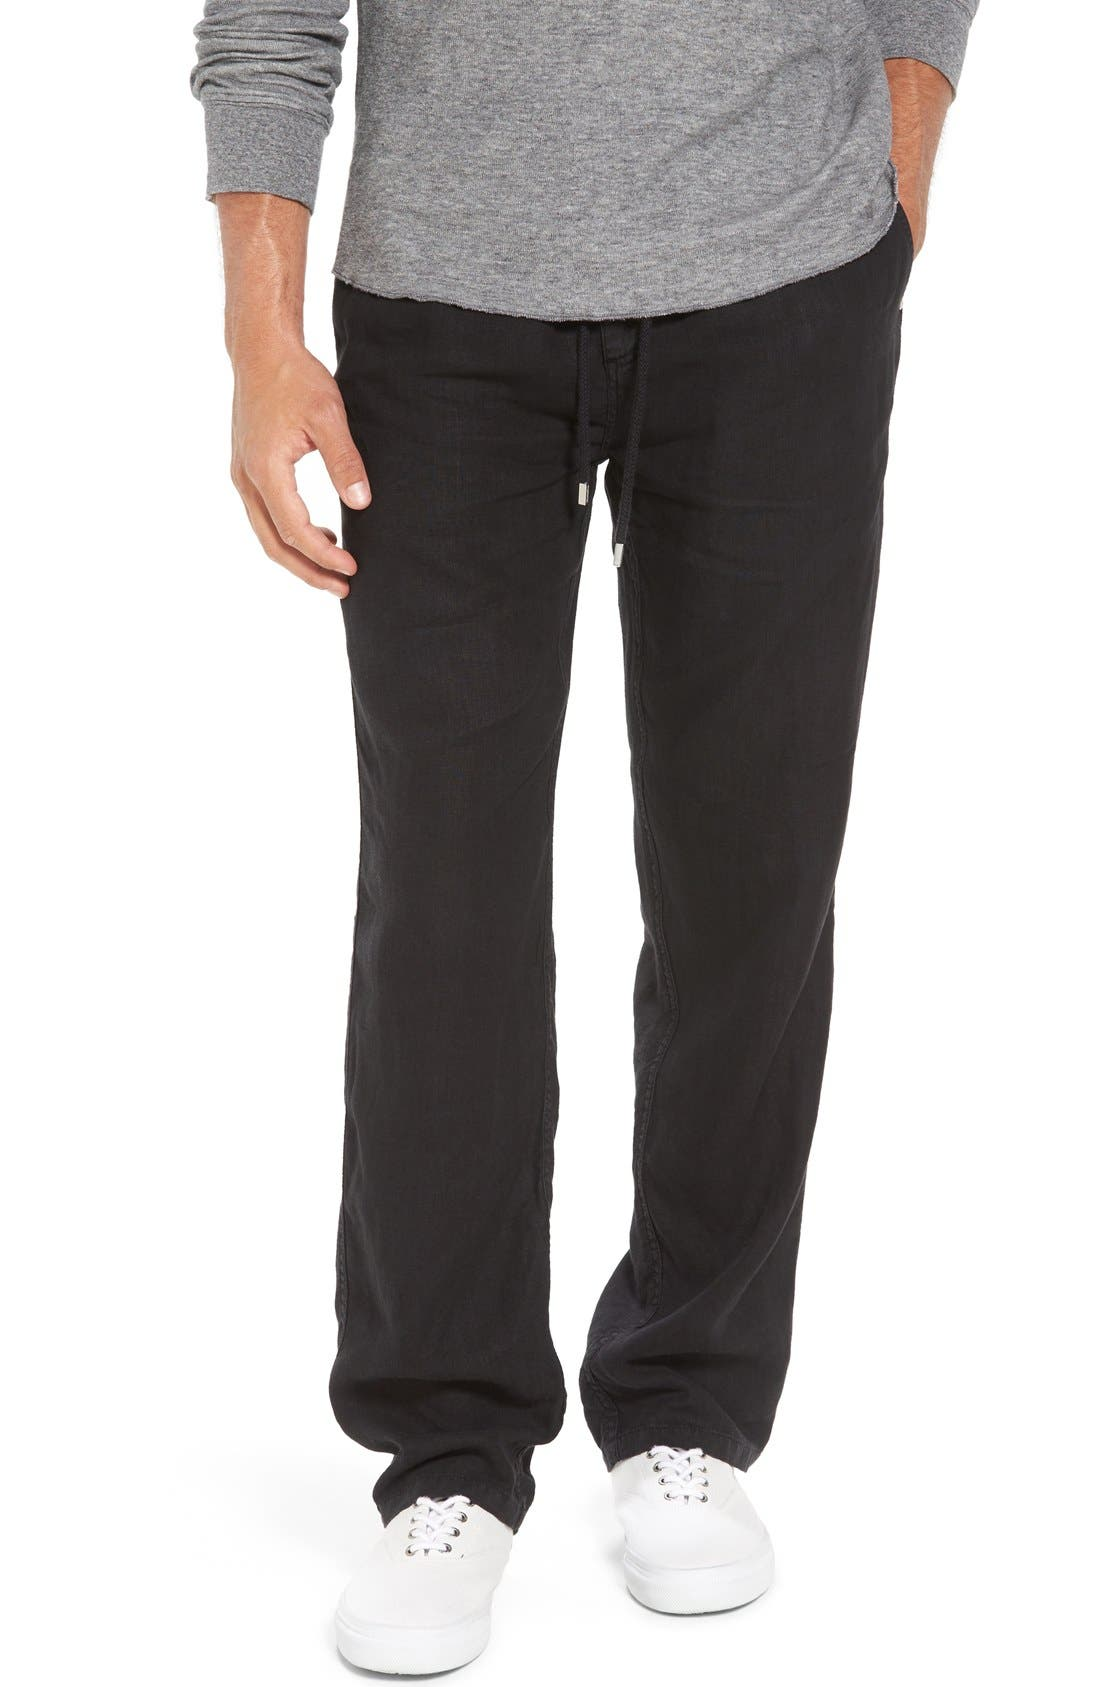 Vilebrequin 'Classic' Linen Pants